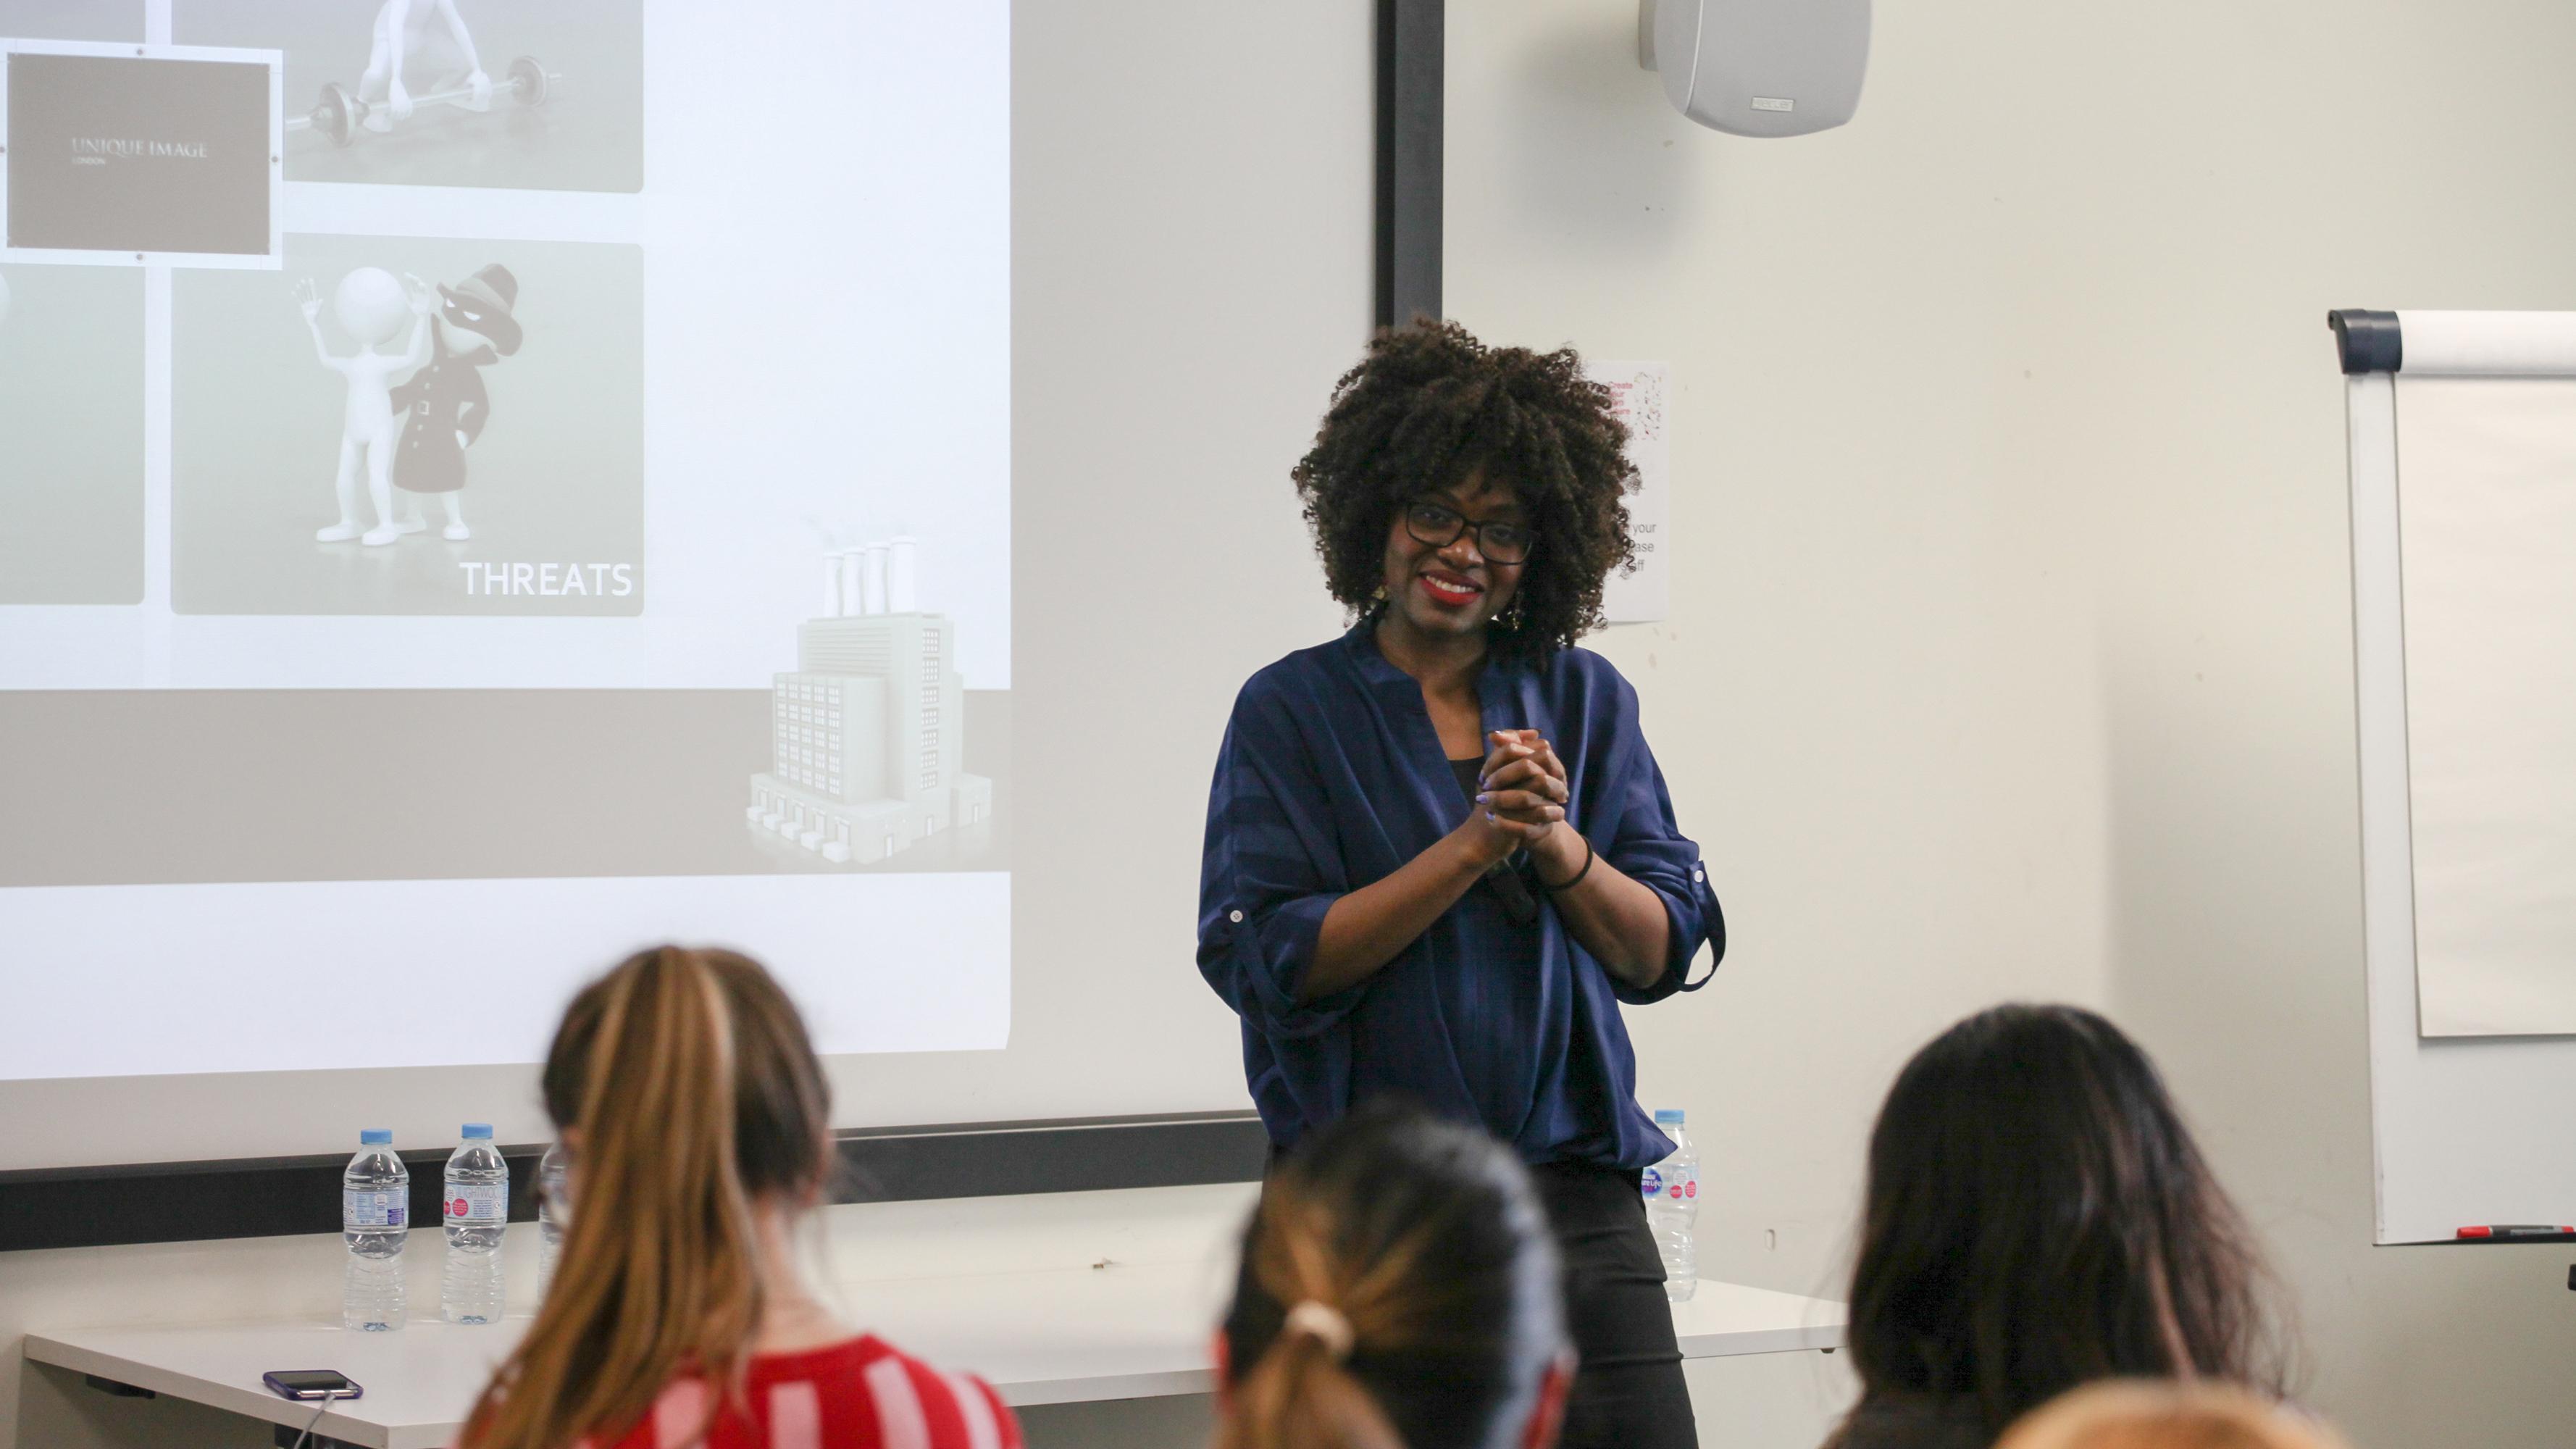 Genevieve Muwana at the Shameless Self-Promotion event.